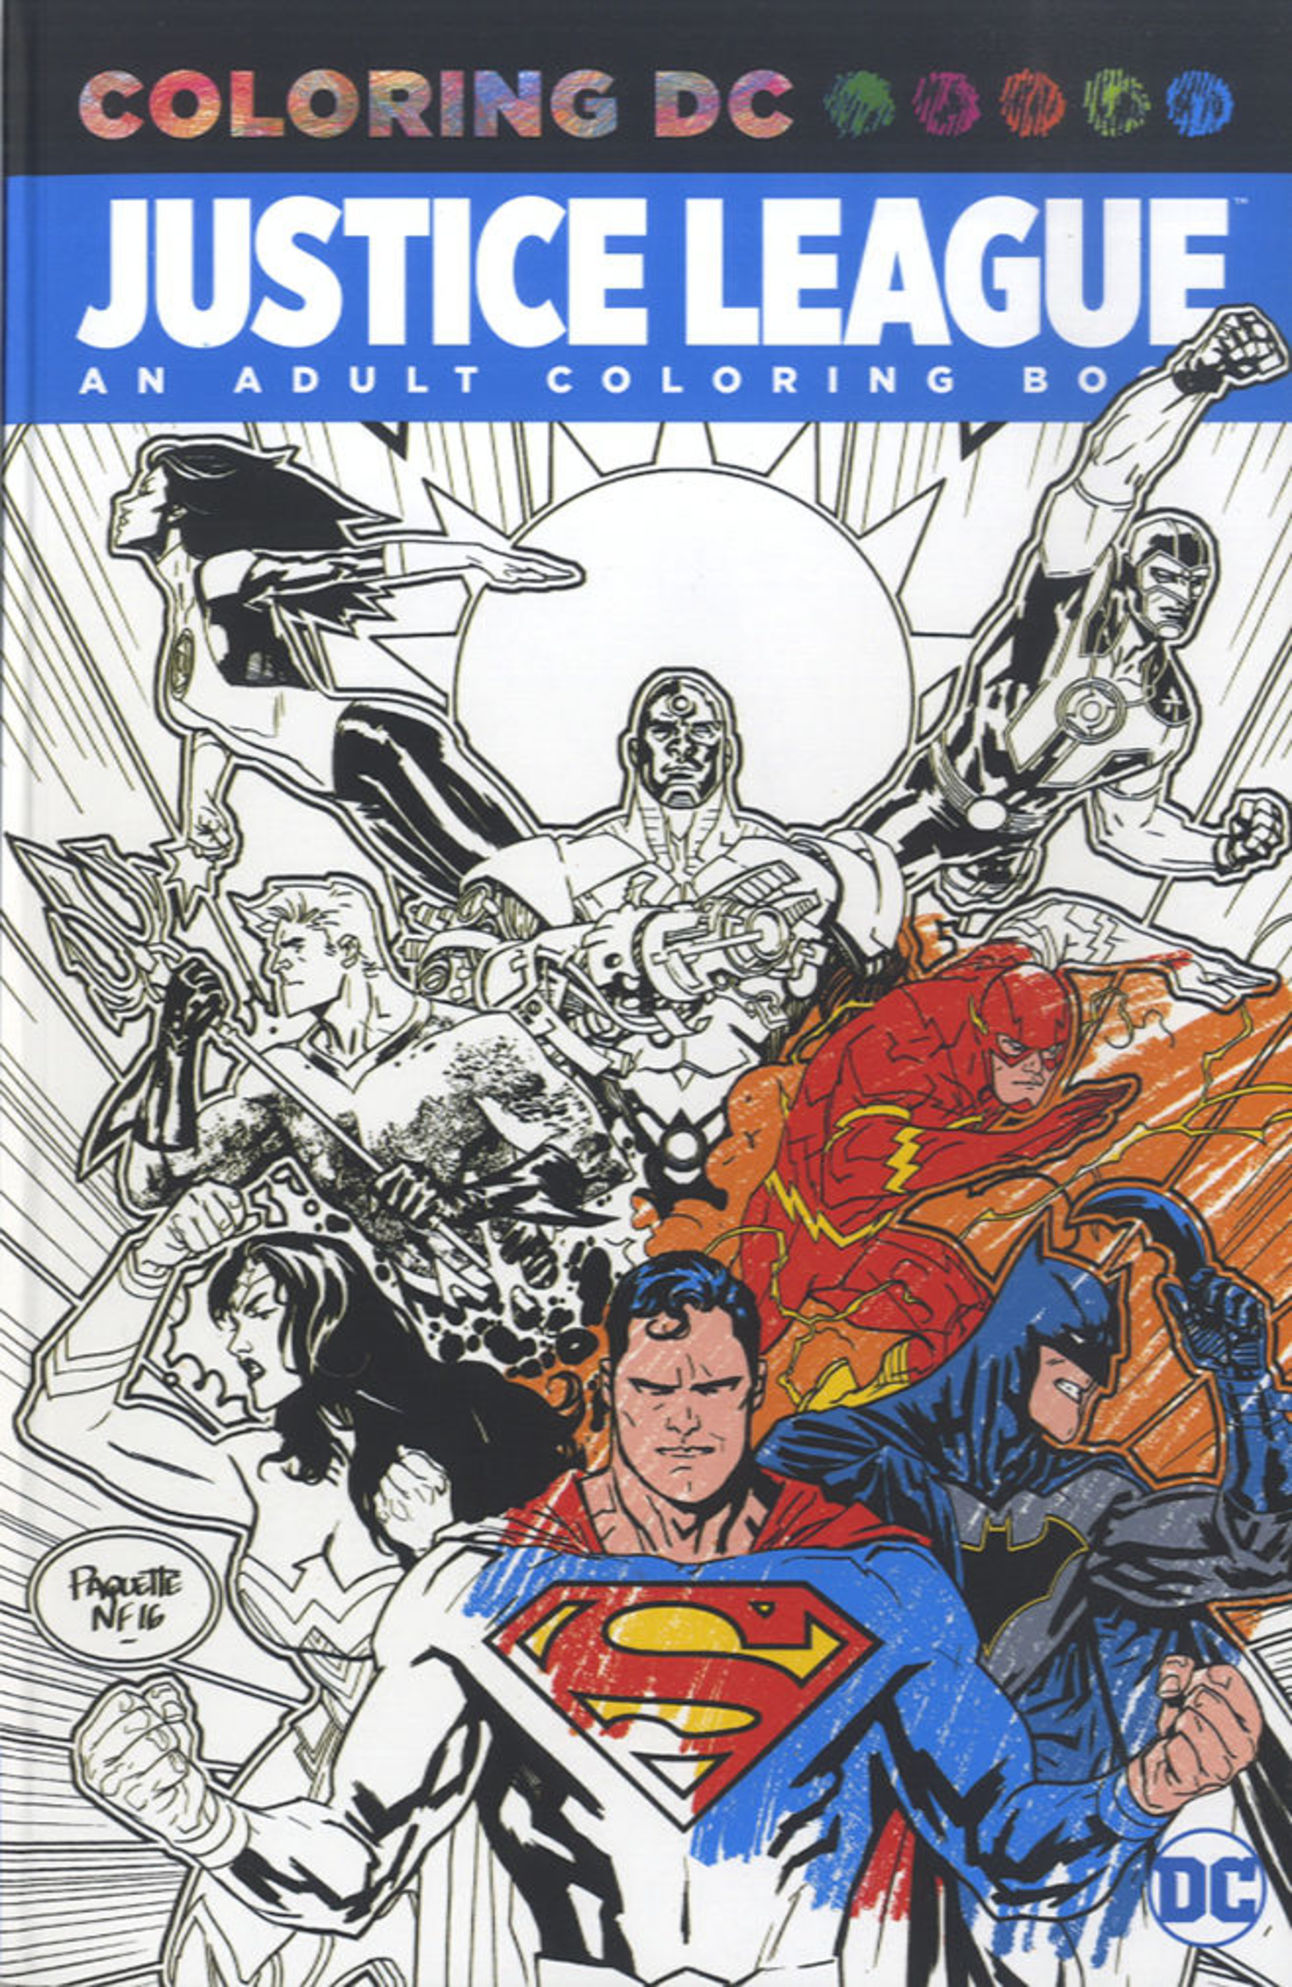 Justice League Coloring Book